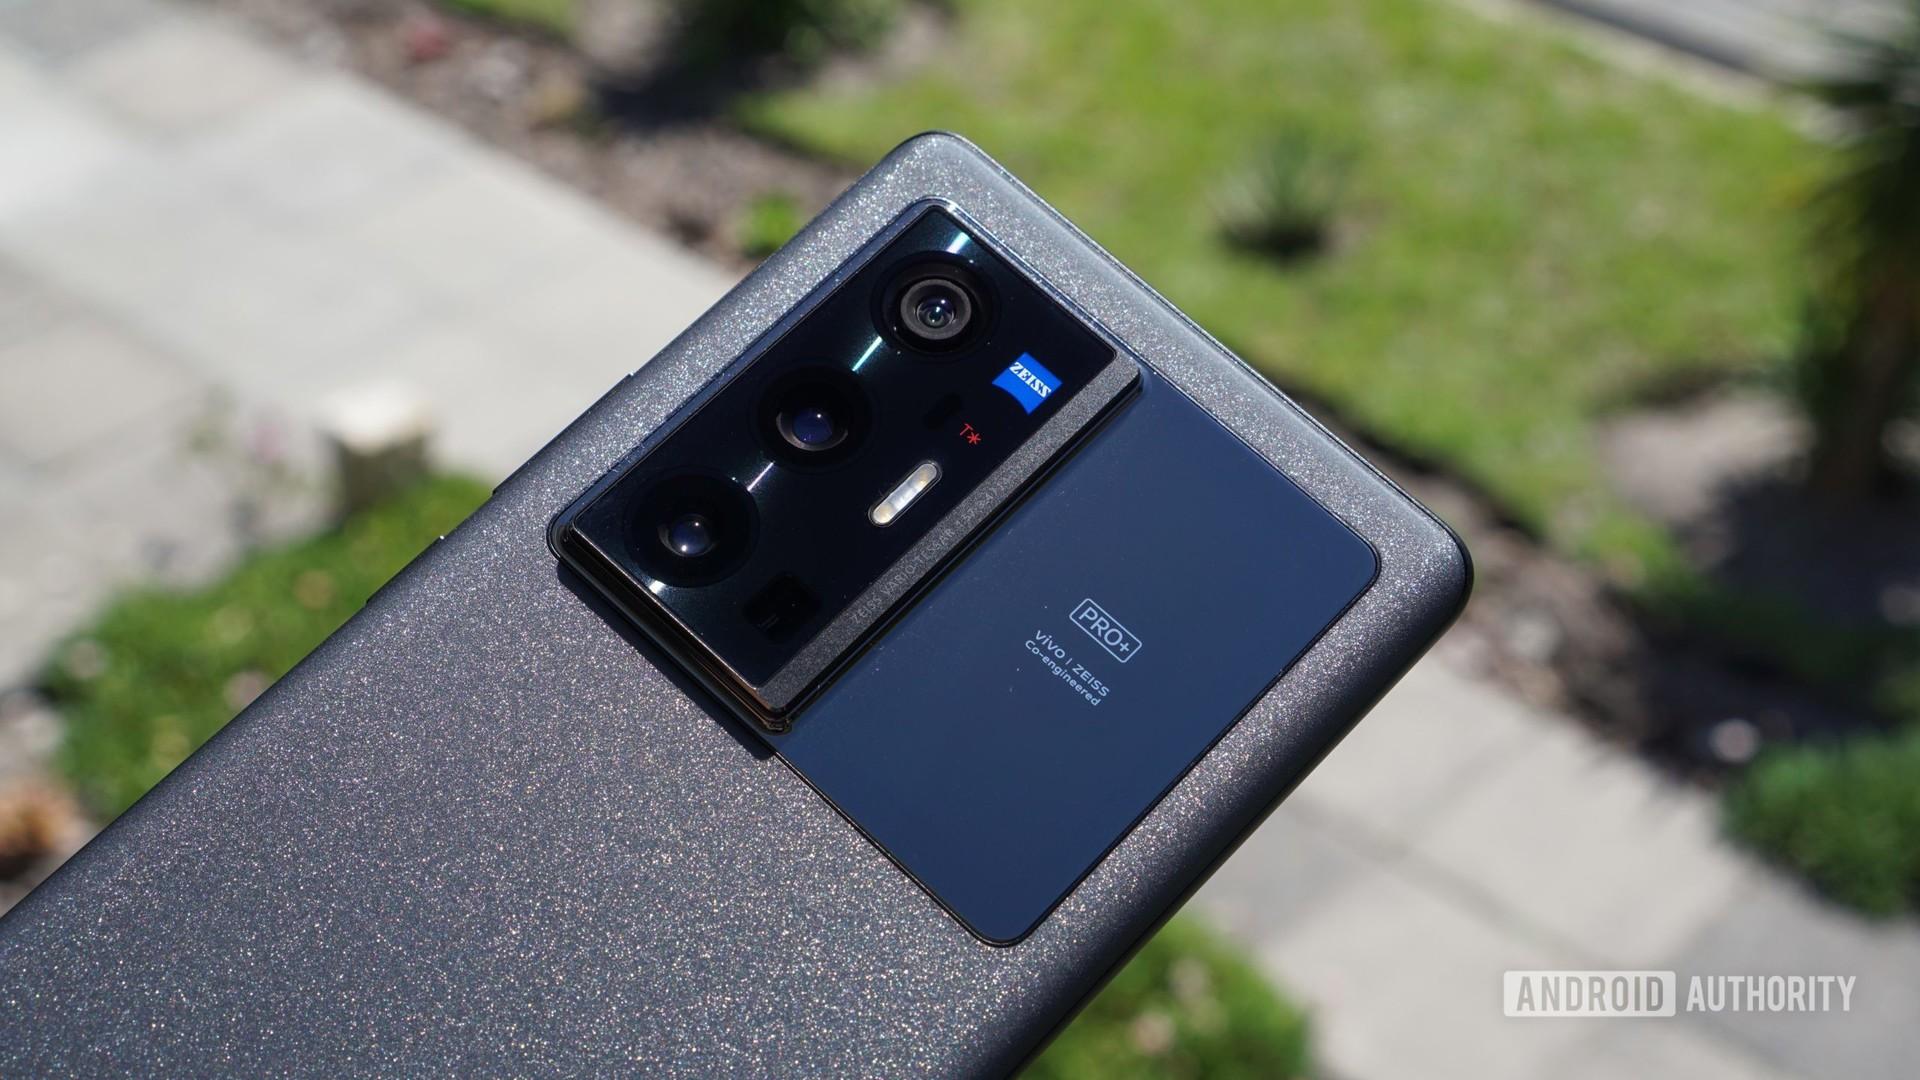 Vivo X70 Pro Plus camera housing and window